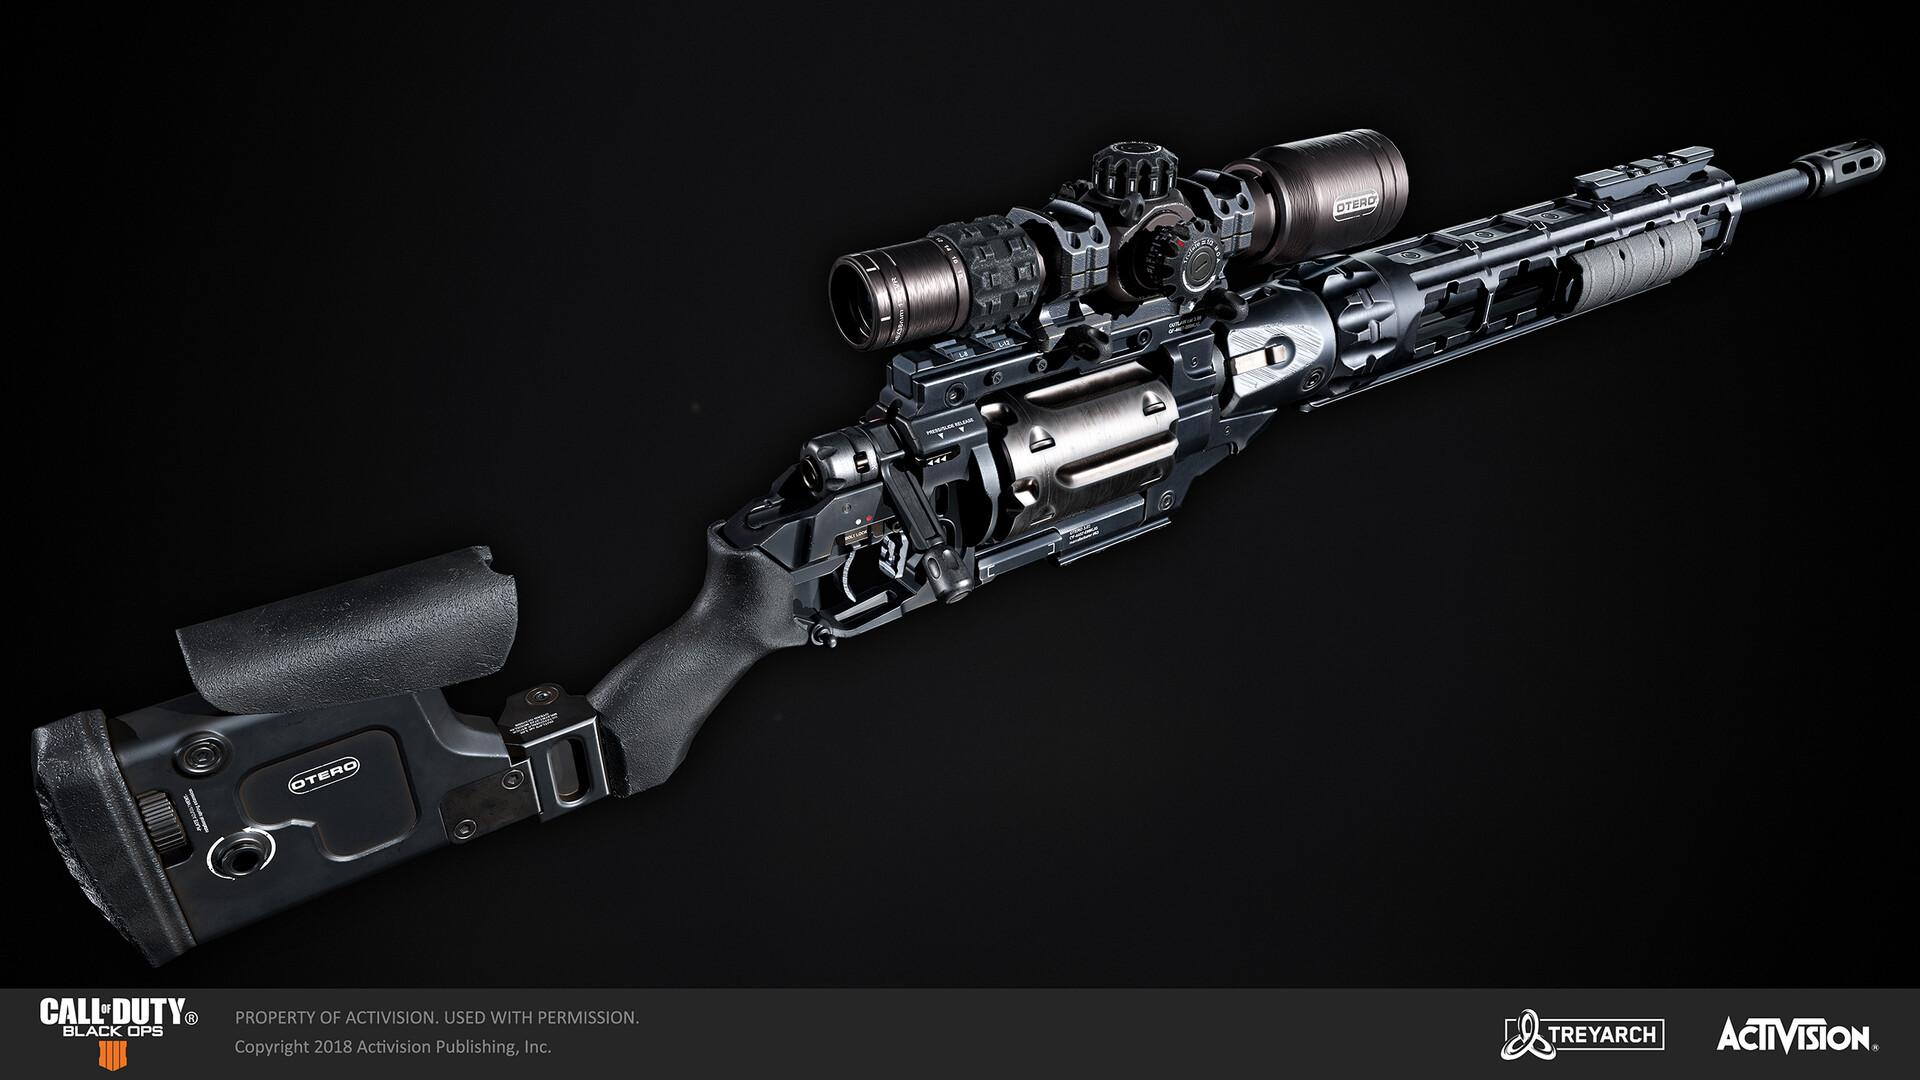 Outlaw Weapon Call Of Duty Wiki Fandom